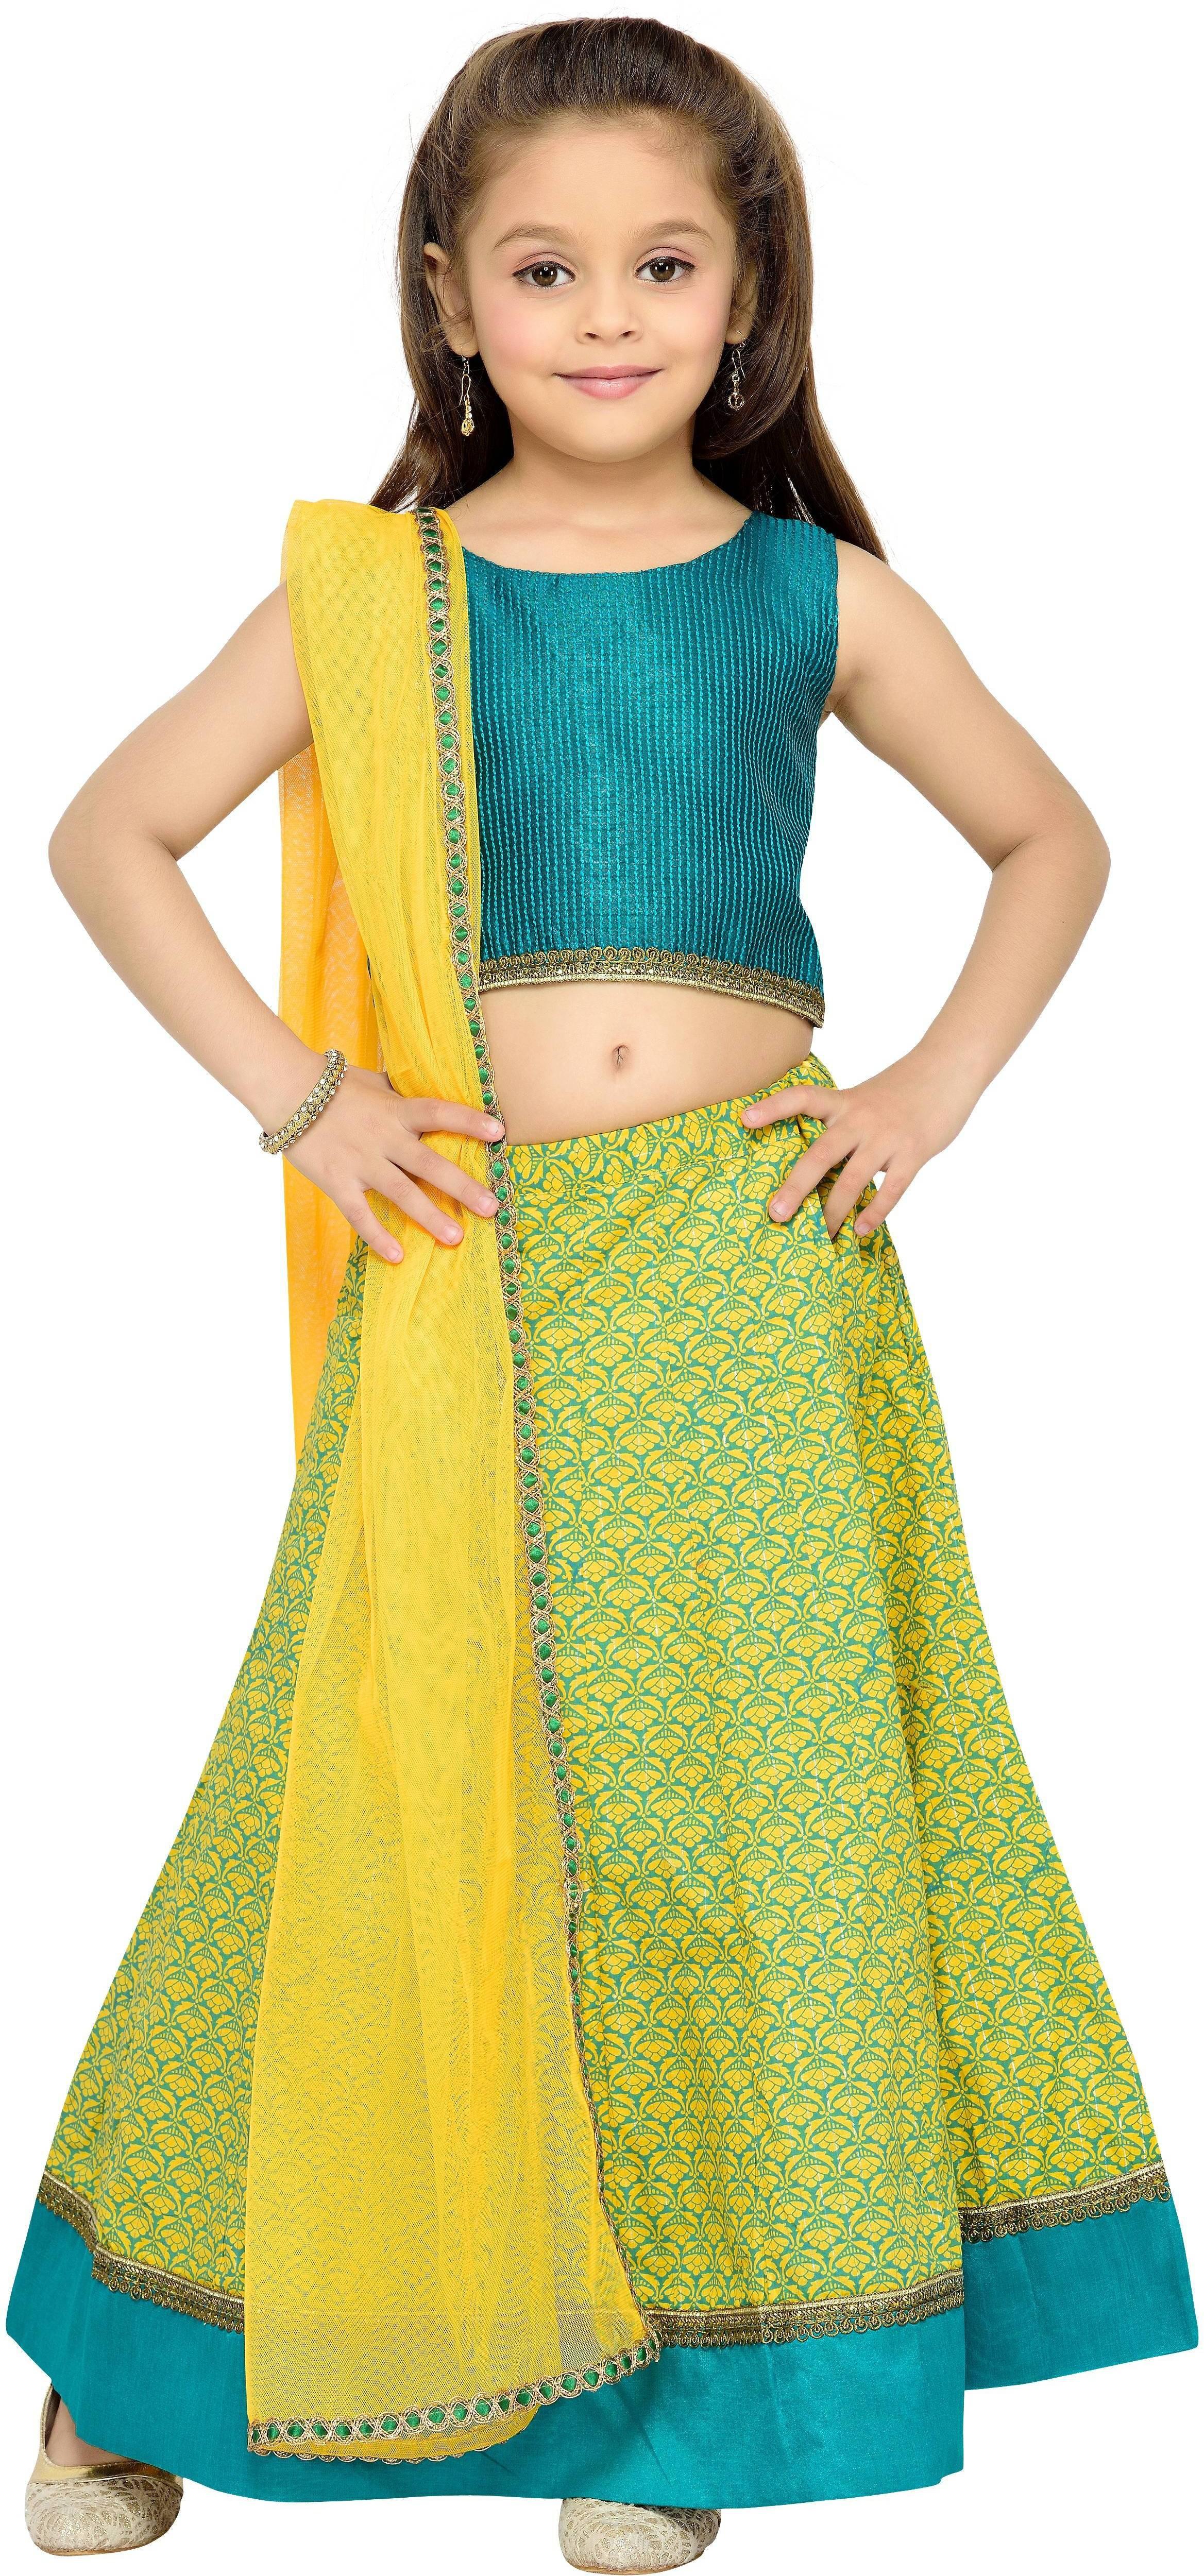 Kay Girls Lehenga Choli Fusion Wear, Ethnic Wear Self Design Lehenga, Choli and Dupatta Set(Yellow, Pack of 1)